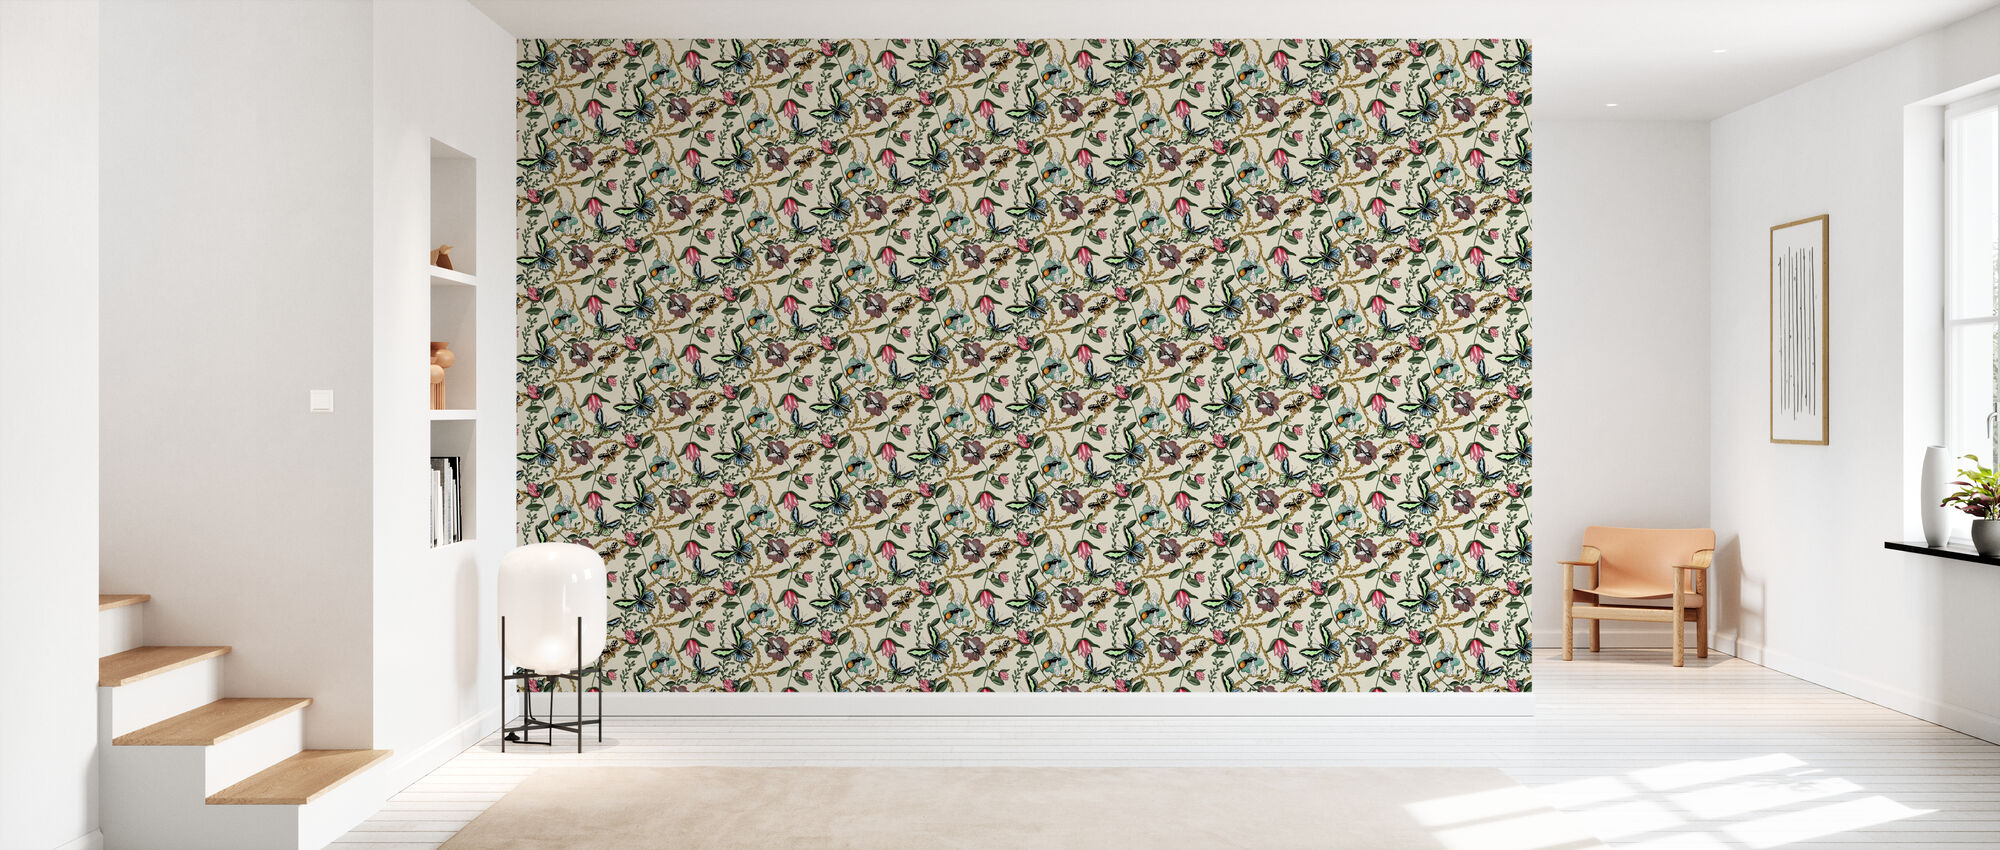 Bugs & Butterflies Offwhite - Small - Wallpaper - Hallway